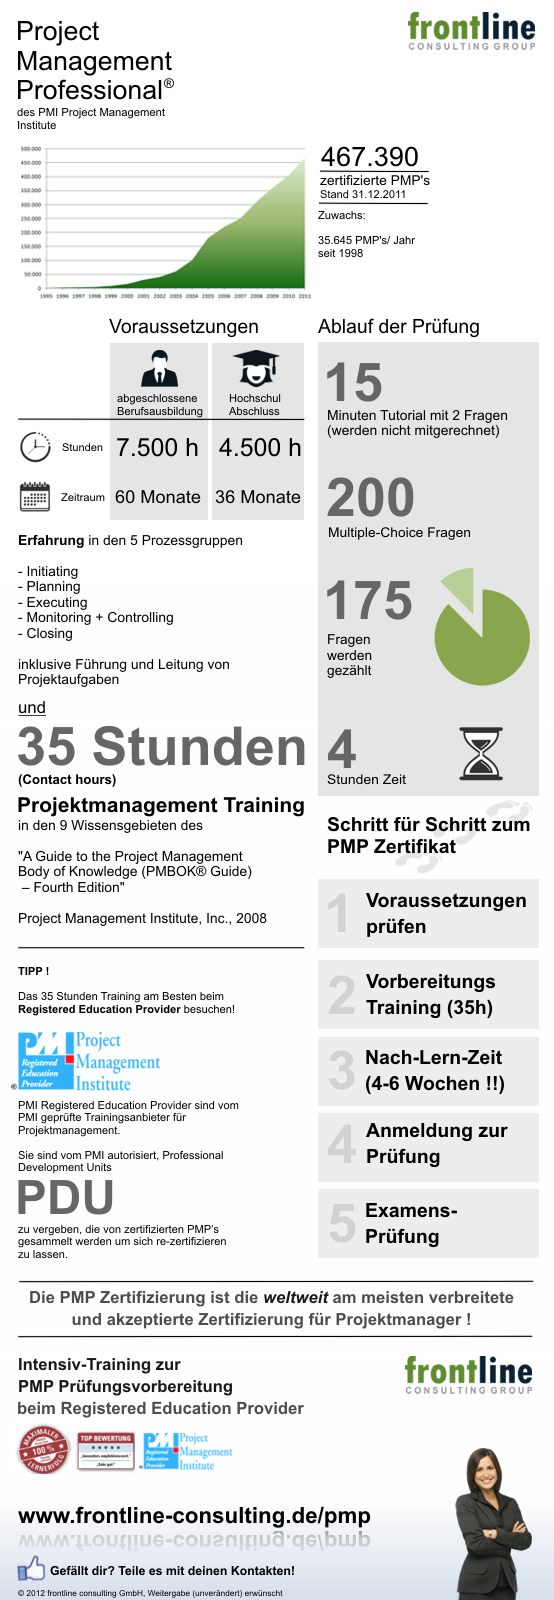 PMP Zertifizierung nach PMI, mehr Infos hier: http://www.frontline-consulting.de/pmp